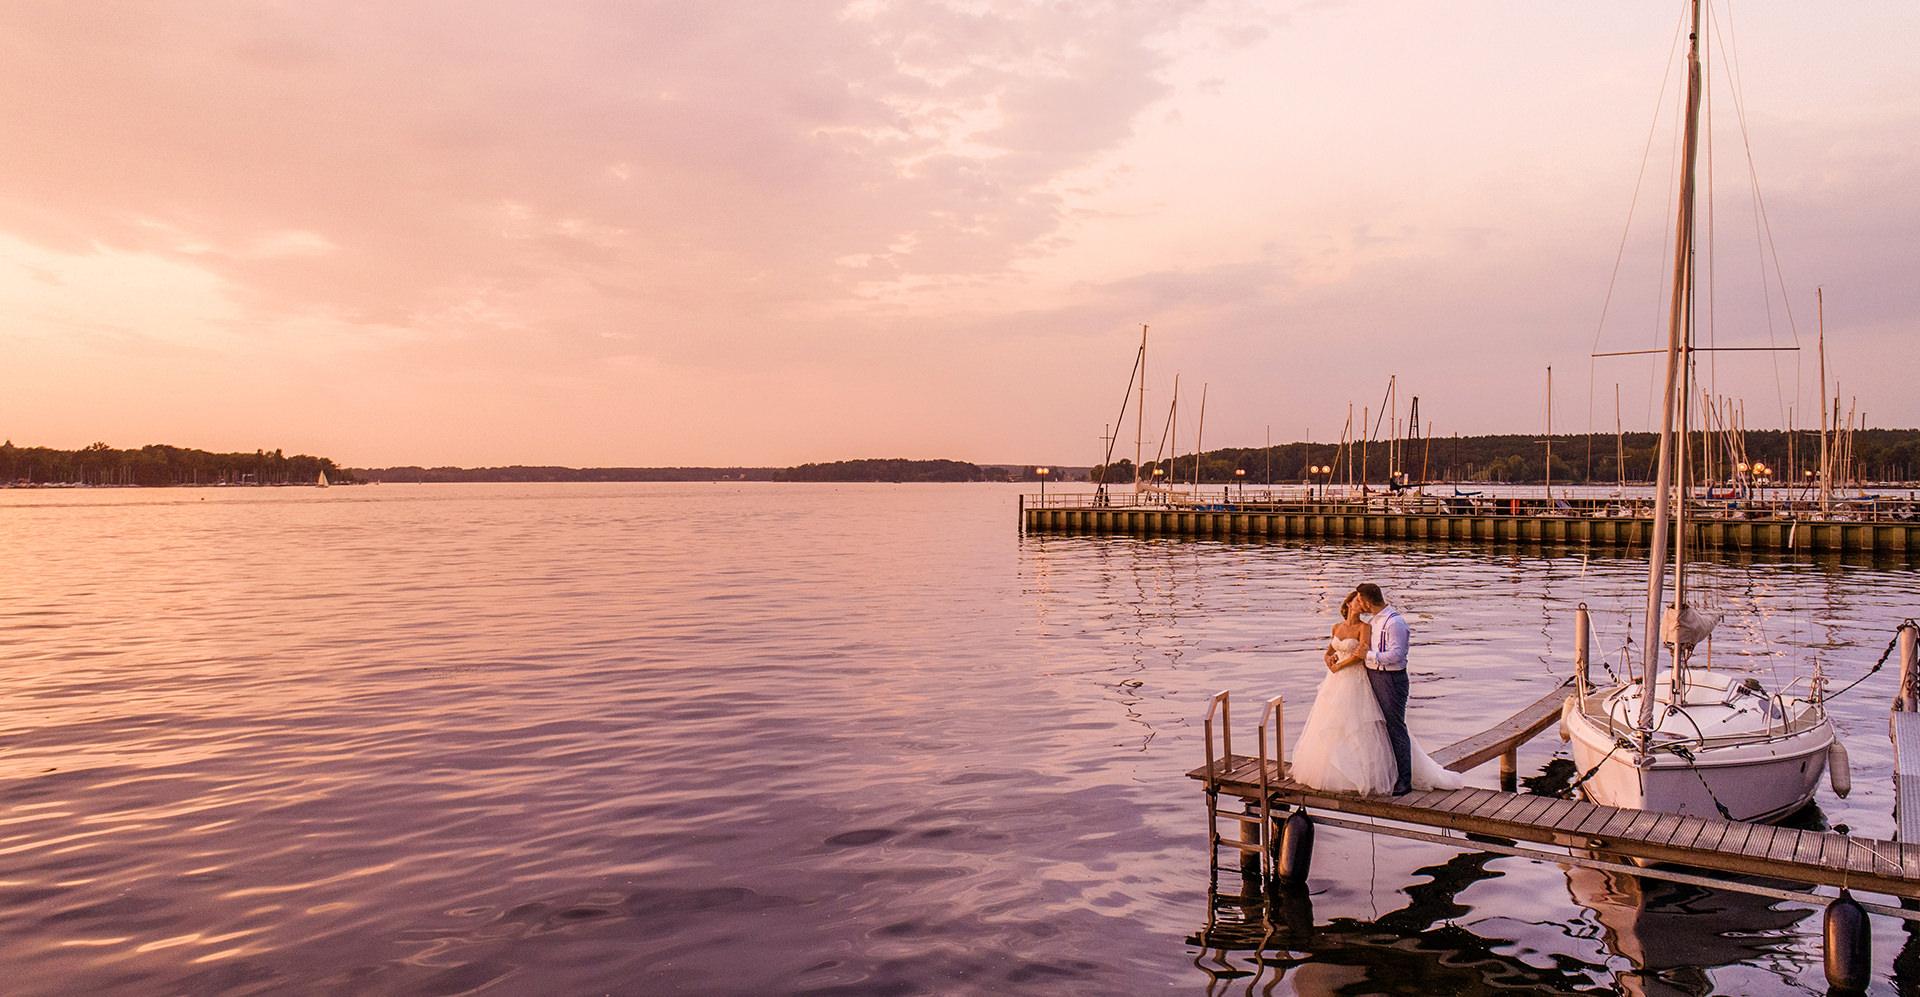 Hochzeitsfoto Berlin Wannsee Brautpaar Sonnenuntergang Steg